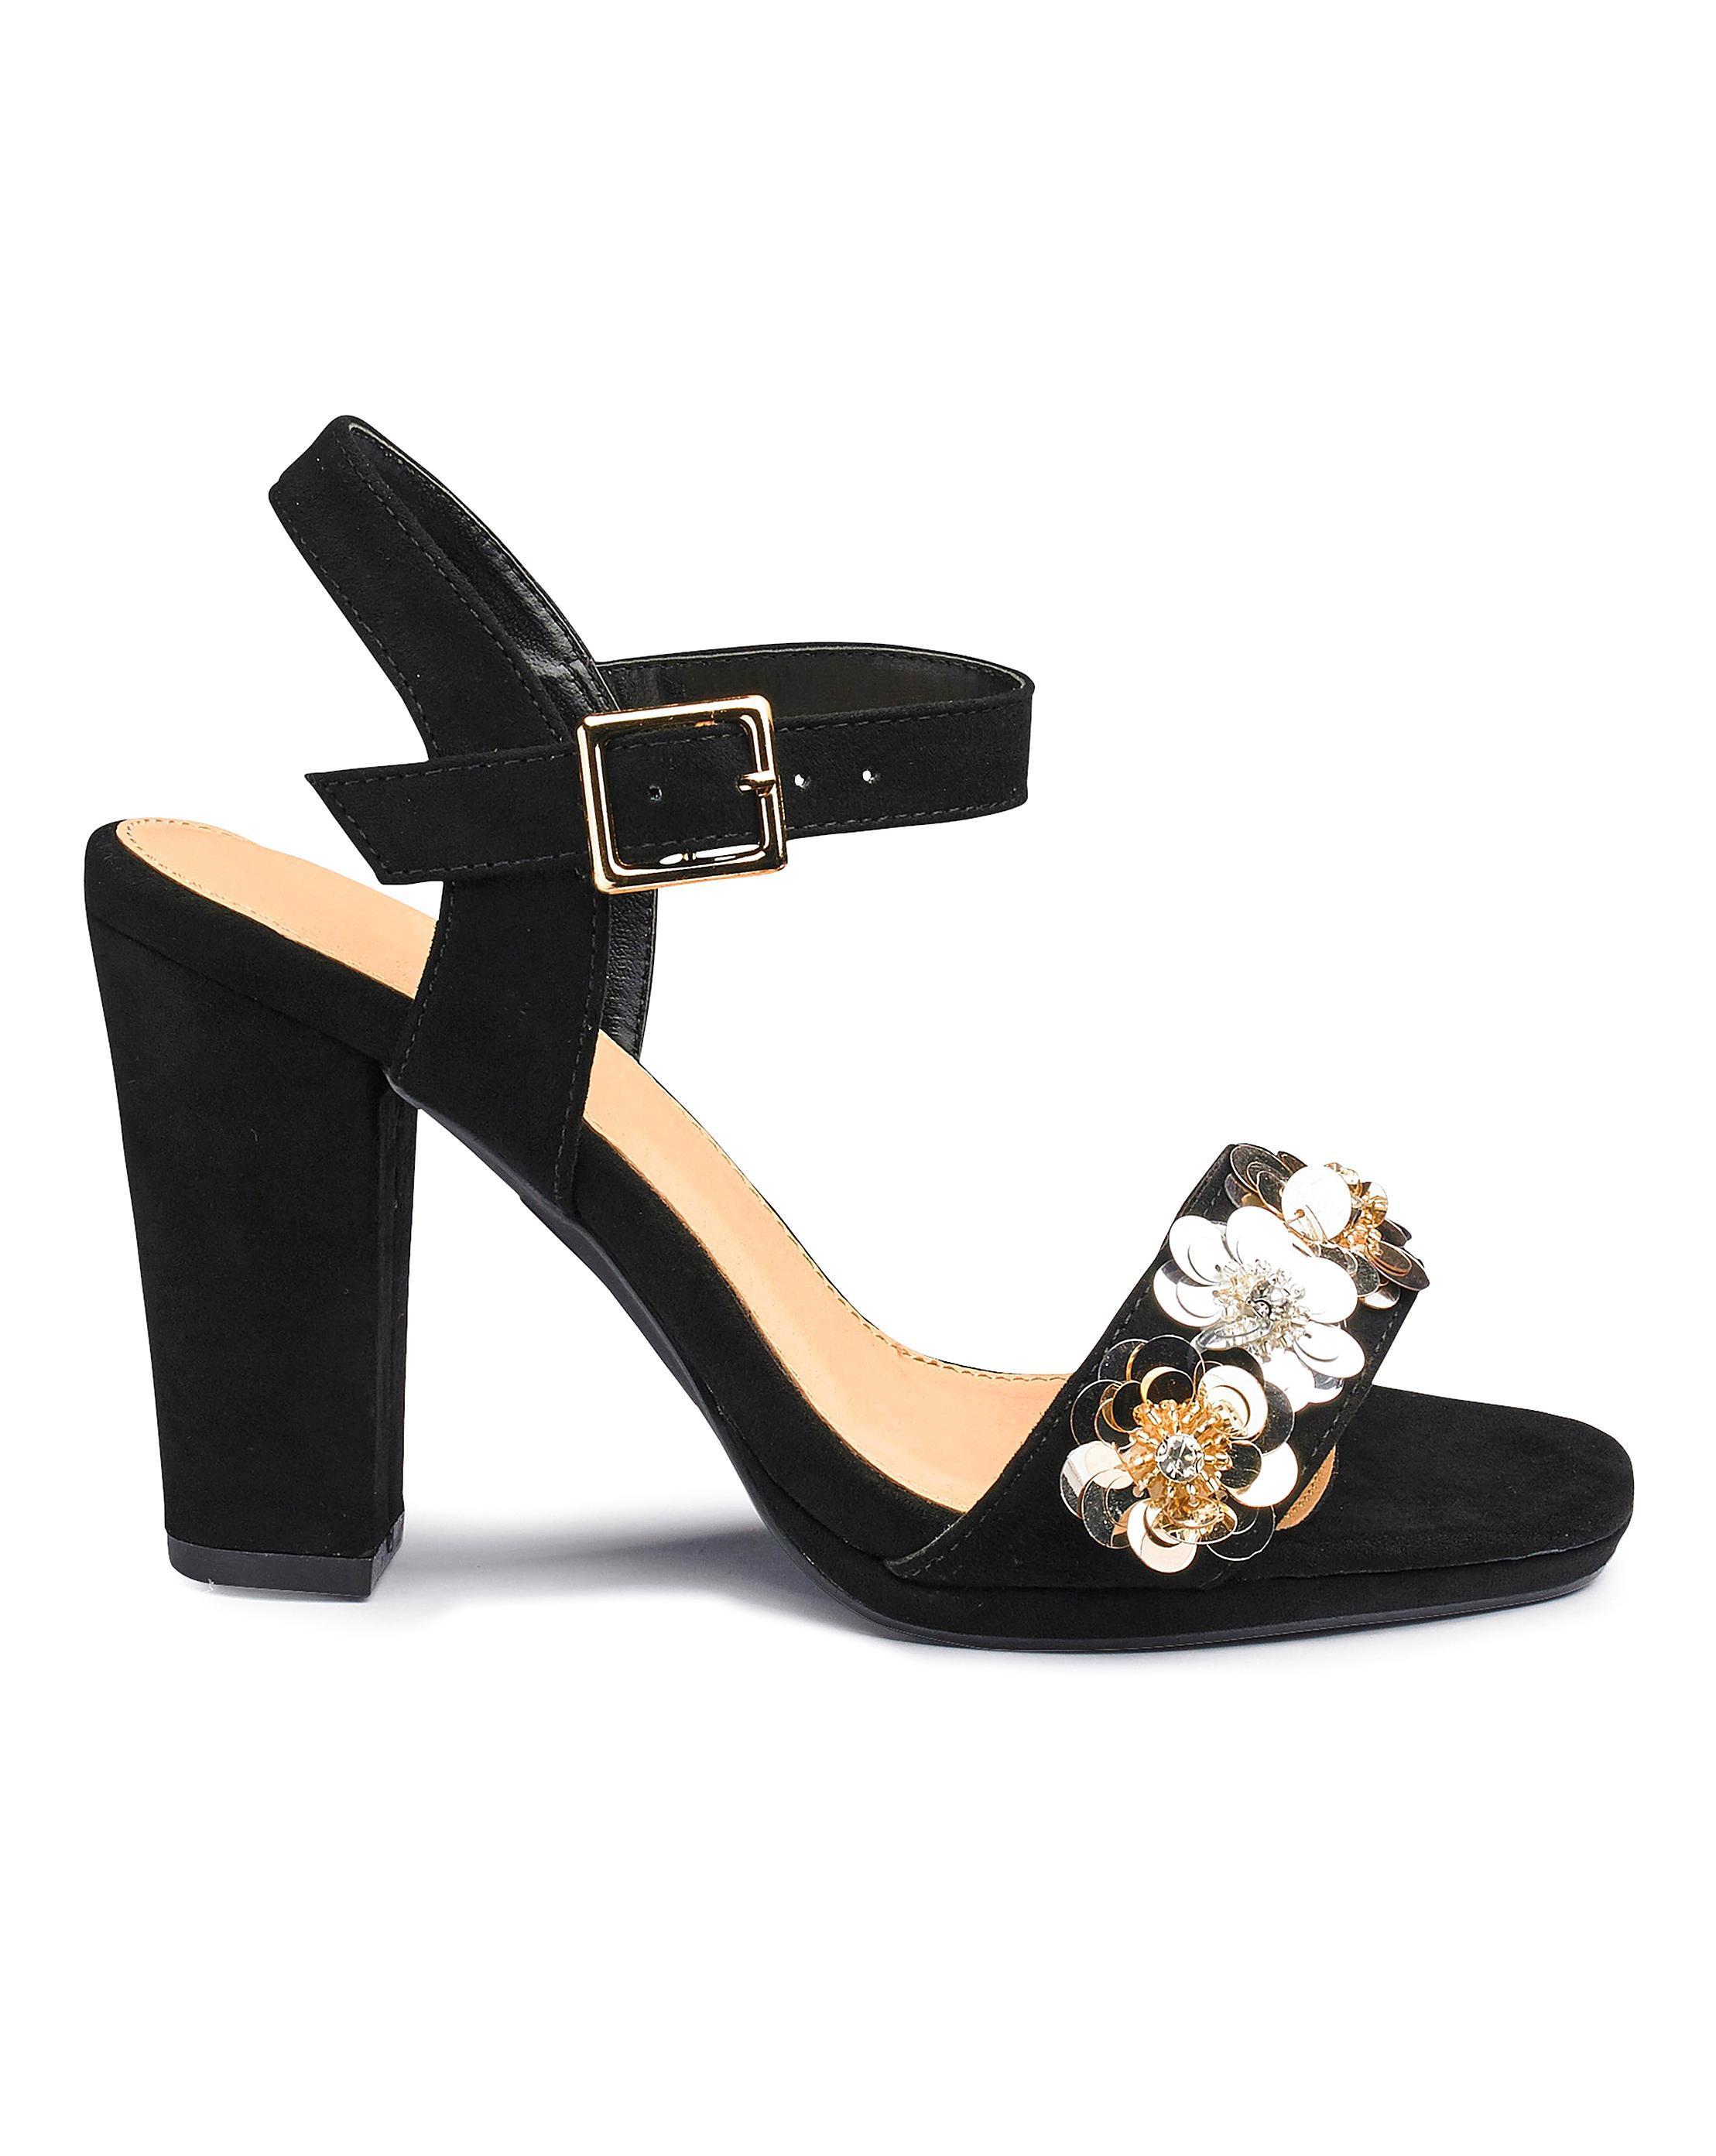 01d491d74 Lyst - Simply Be Sole Diva Flower Trim Heels in Black